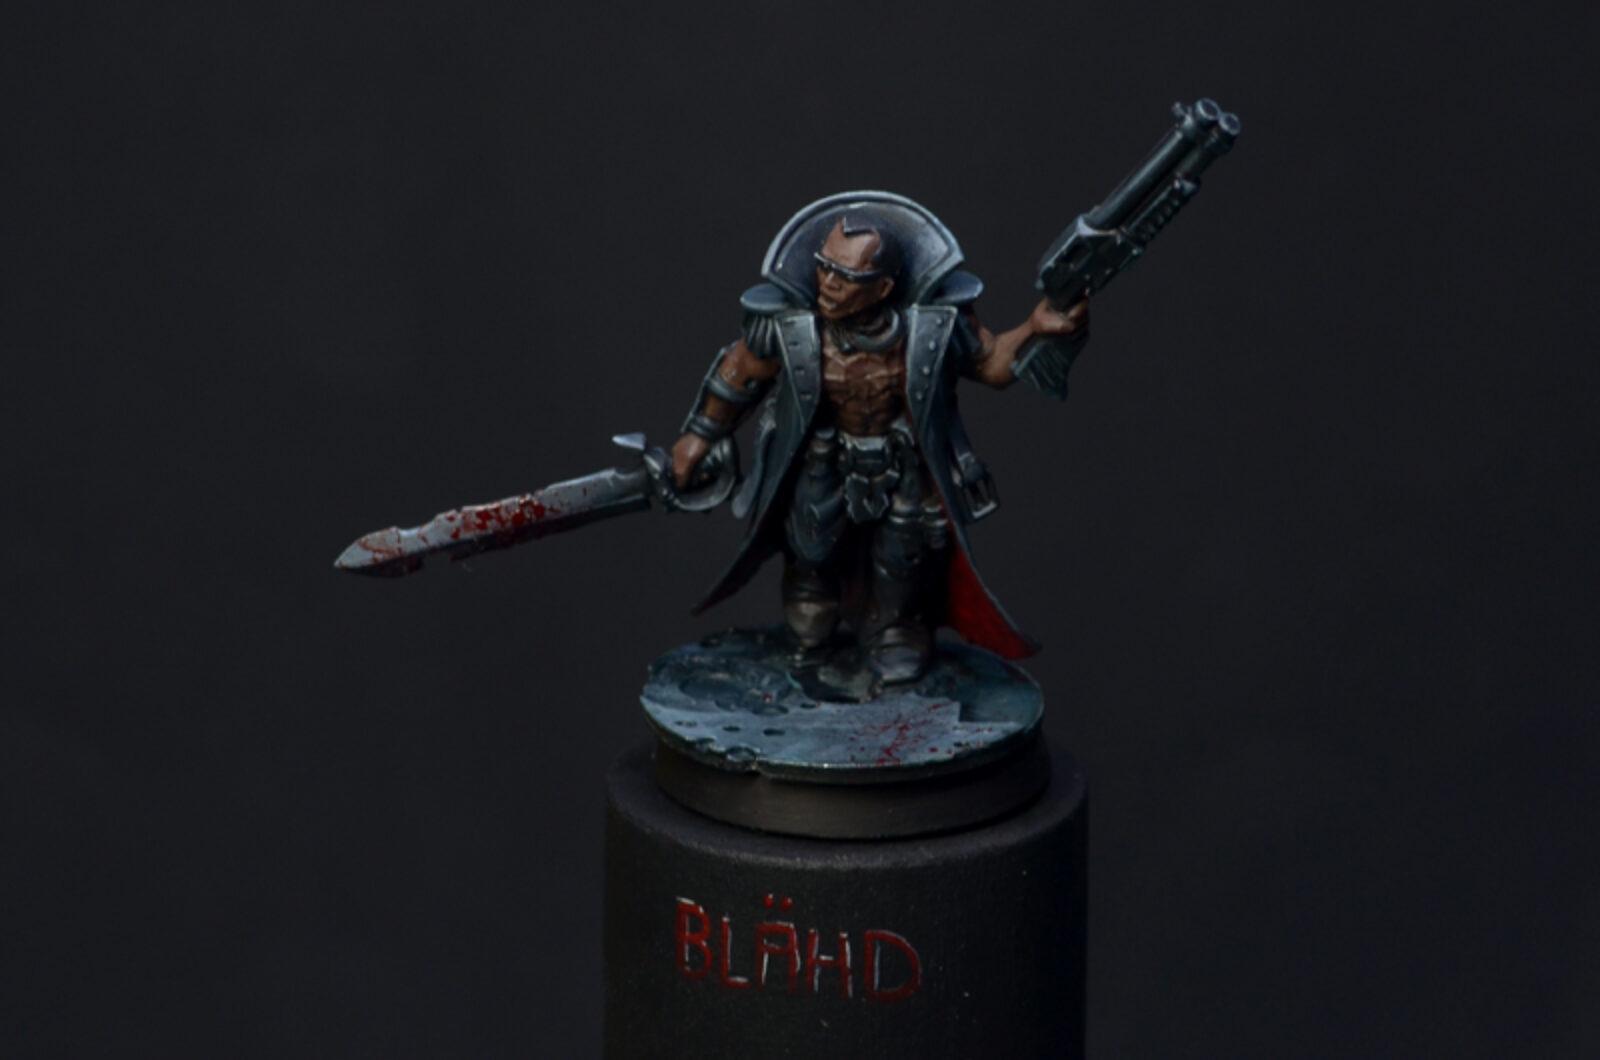 Blade01